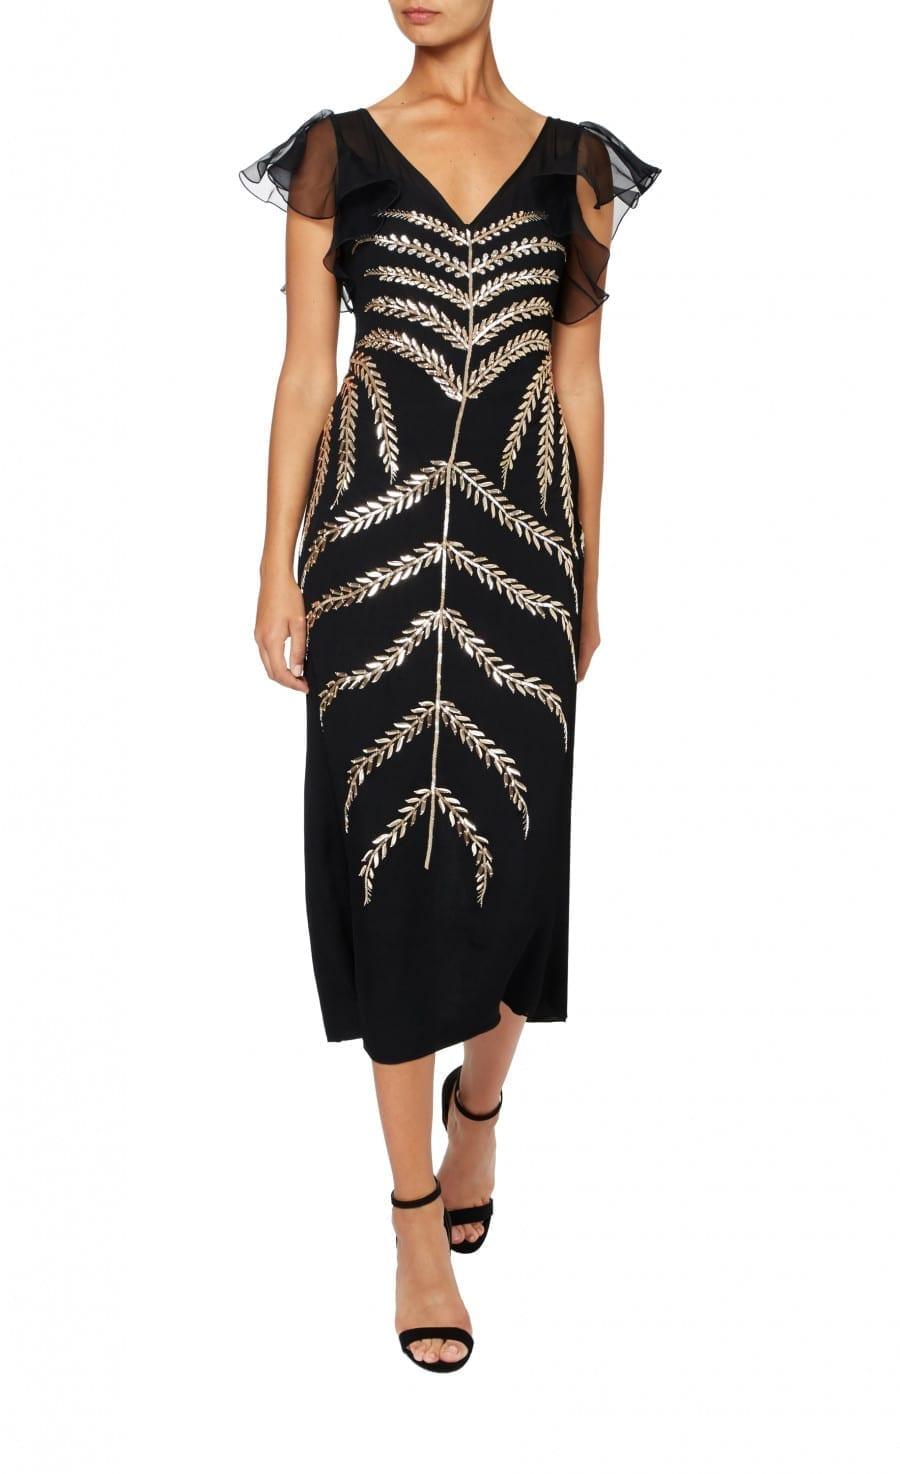 TEMPERLEY LONDON Savannah Black Dress